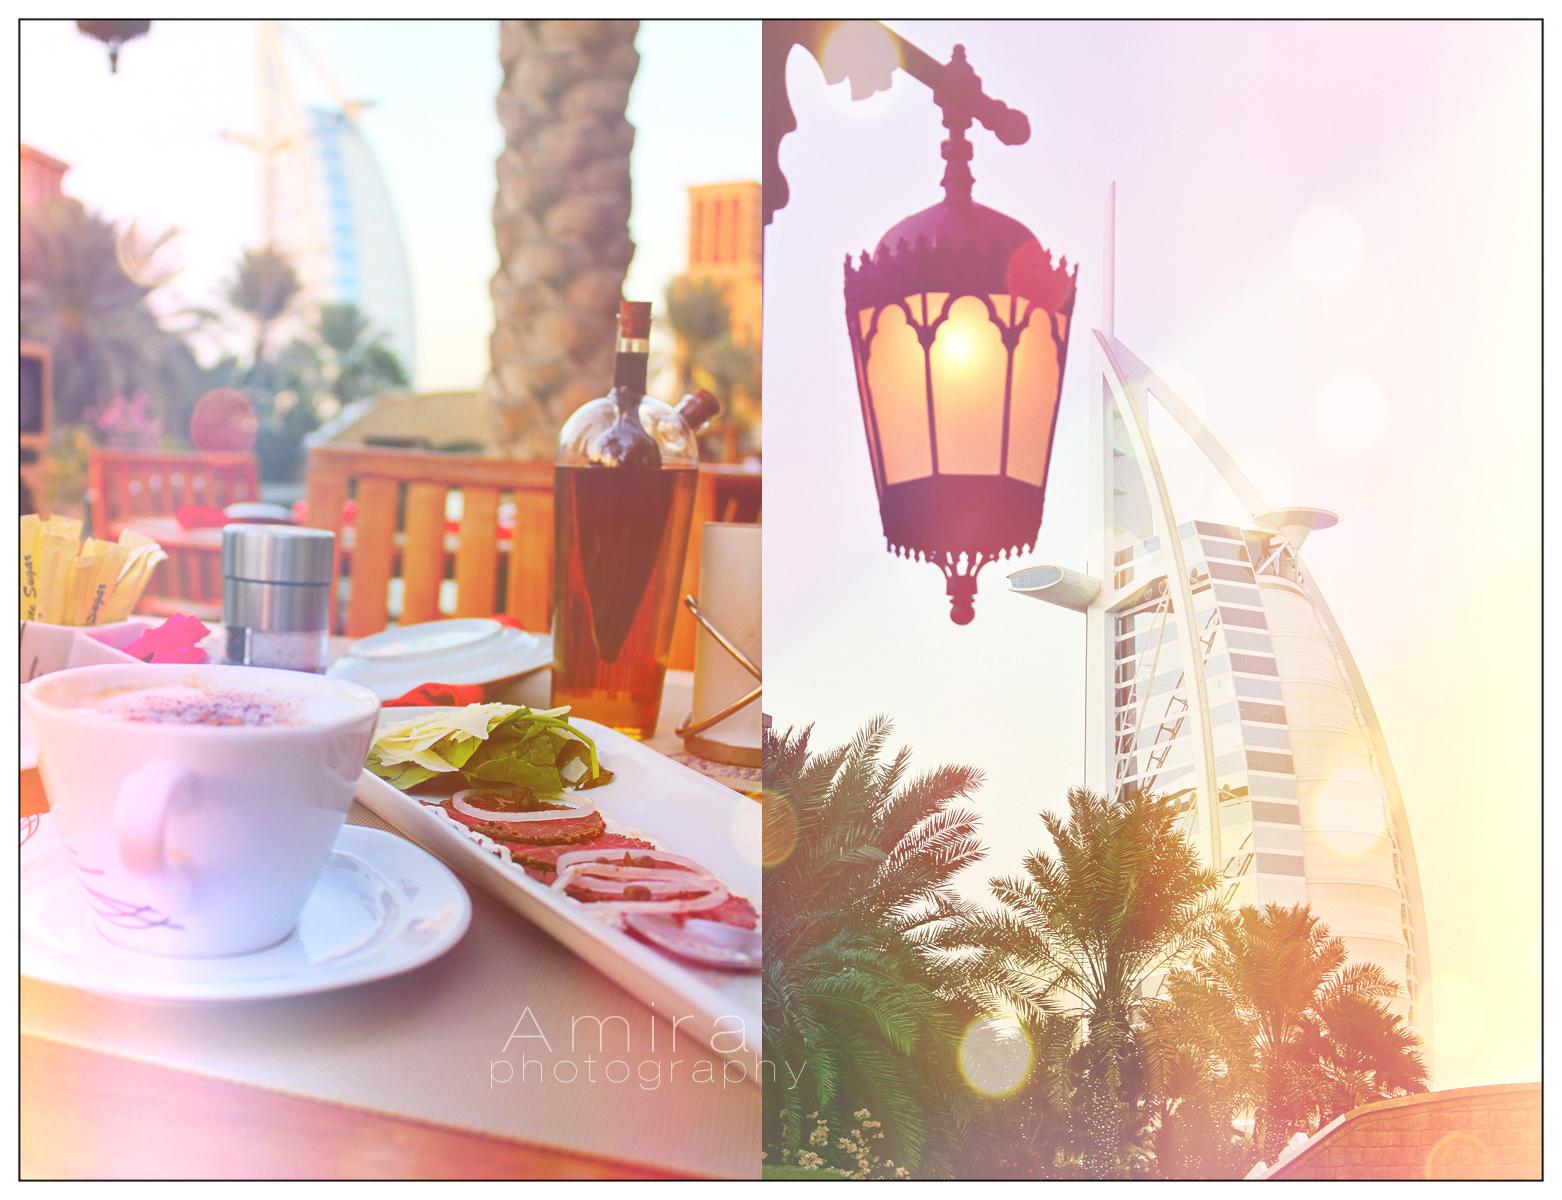 luxury view to Burj Al Arab by amirajuli